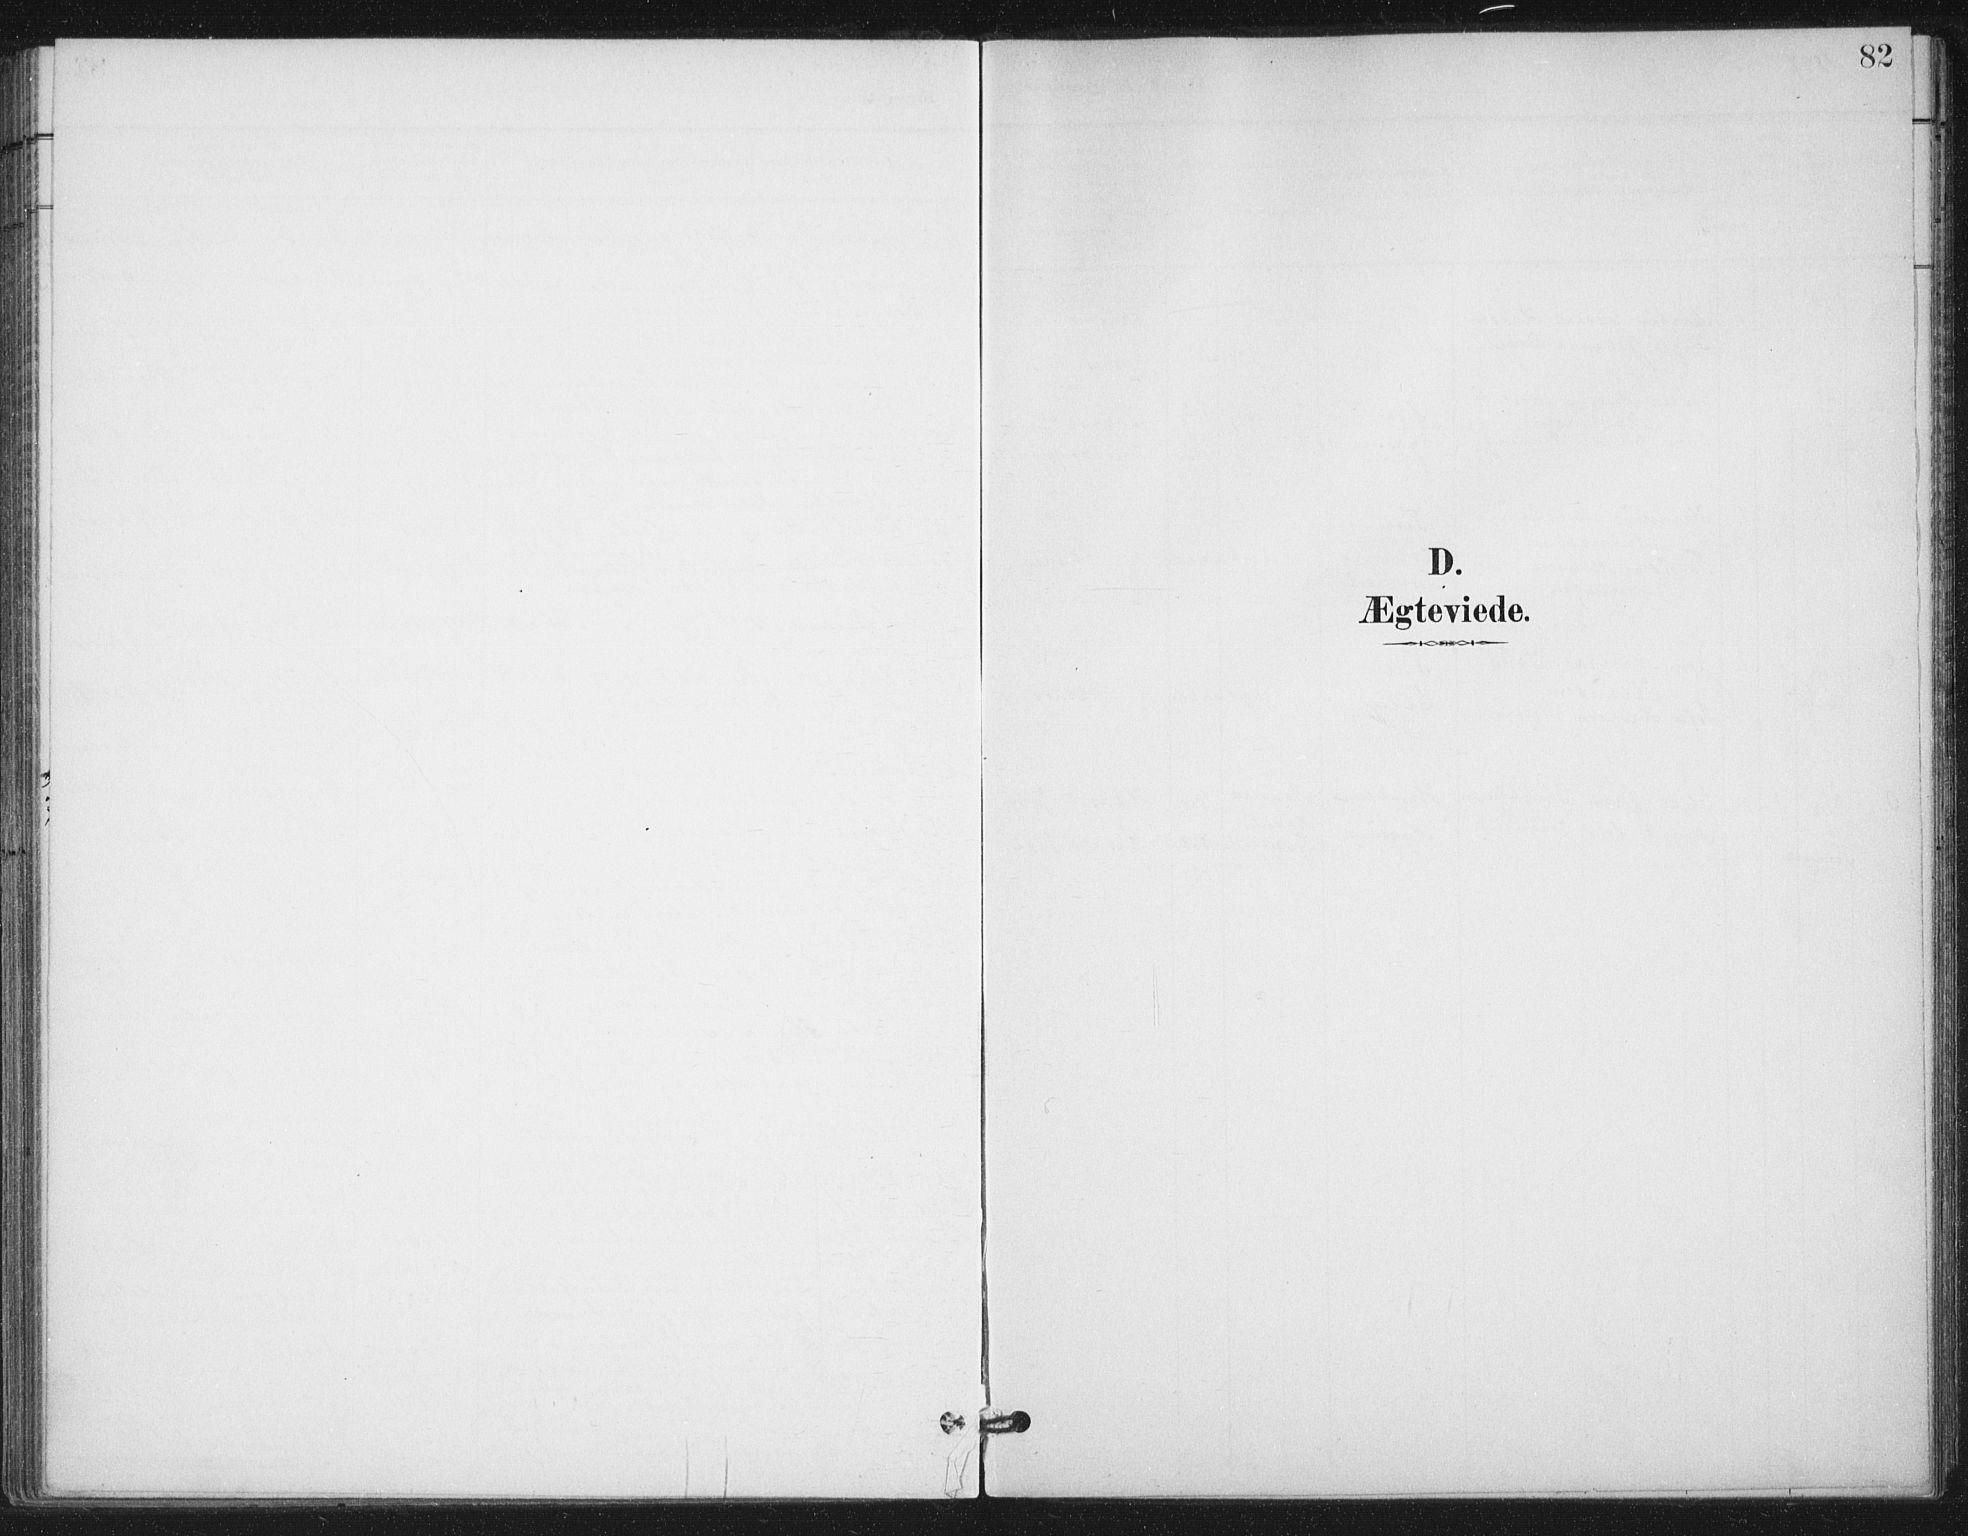 SAT, Ministerialprotokoller, klokkerbøker og fødselsregistre - Nordland, 894/L1356: Ministerialbok nr. 894A02, 1897-1914, s. 82